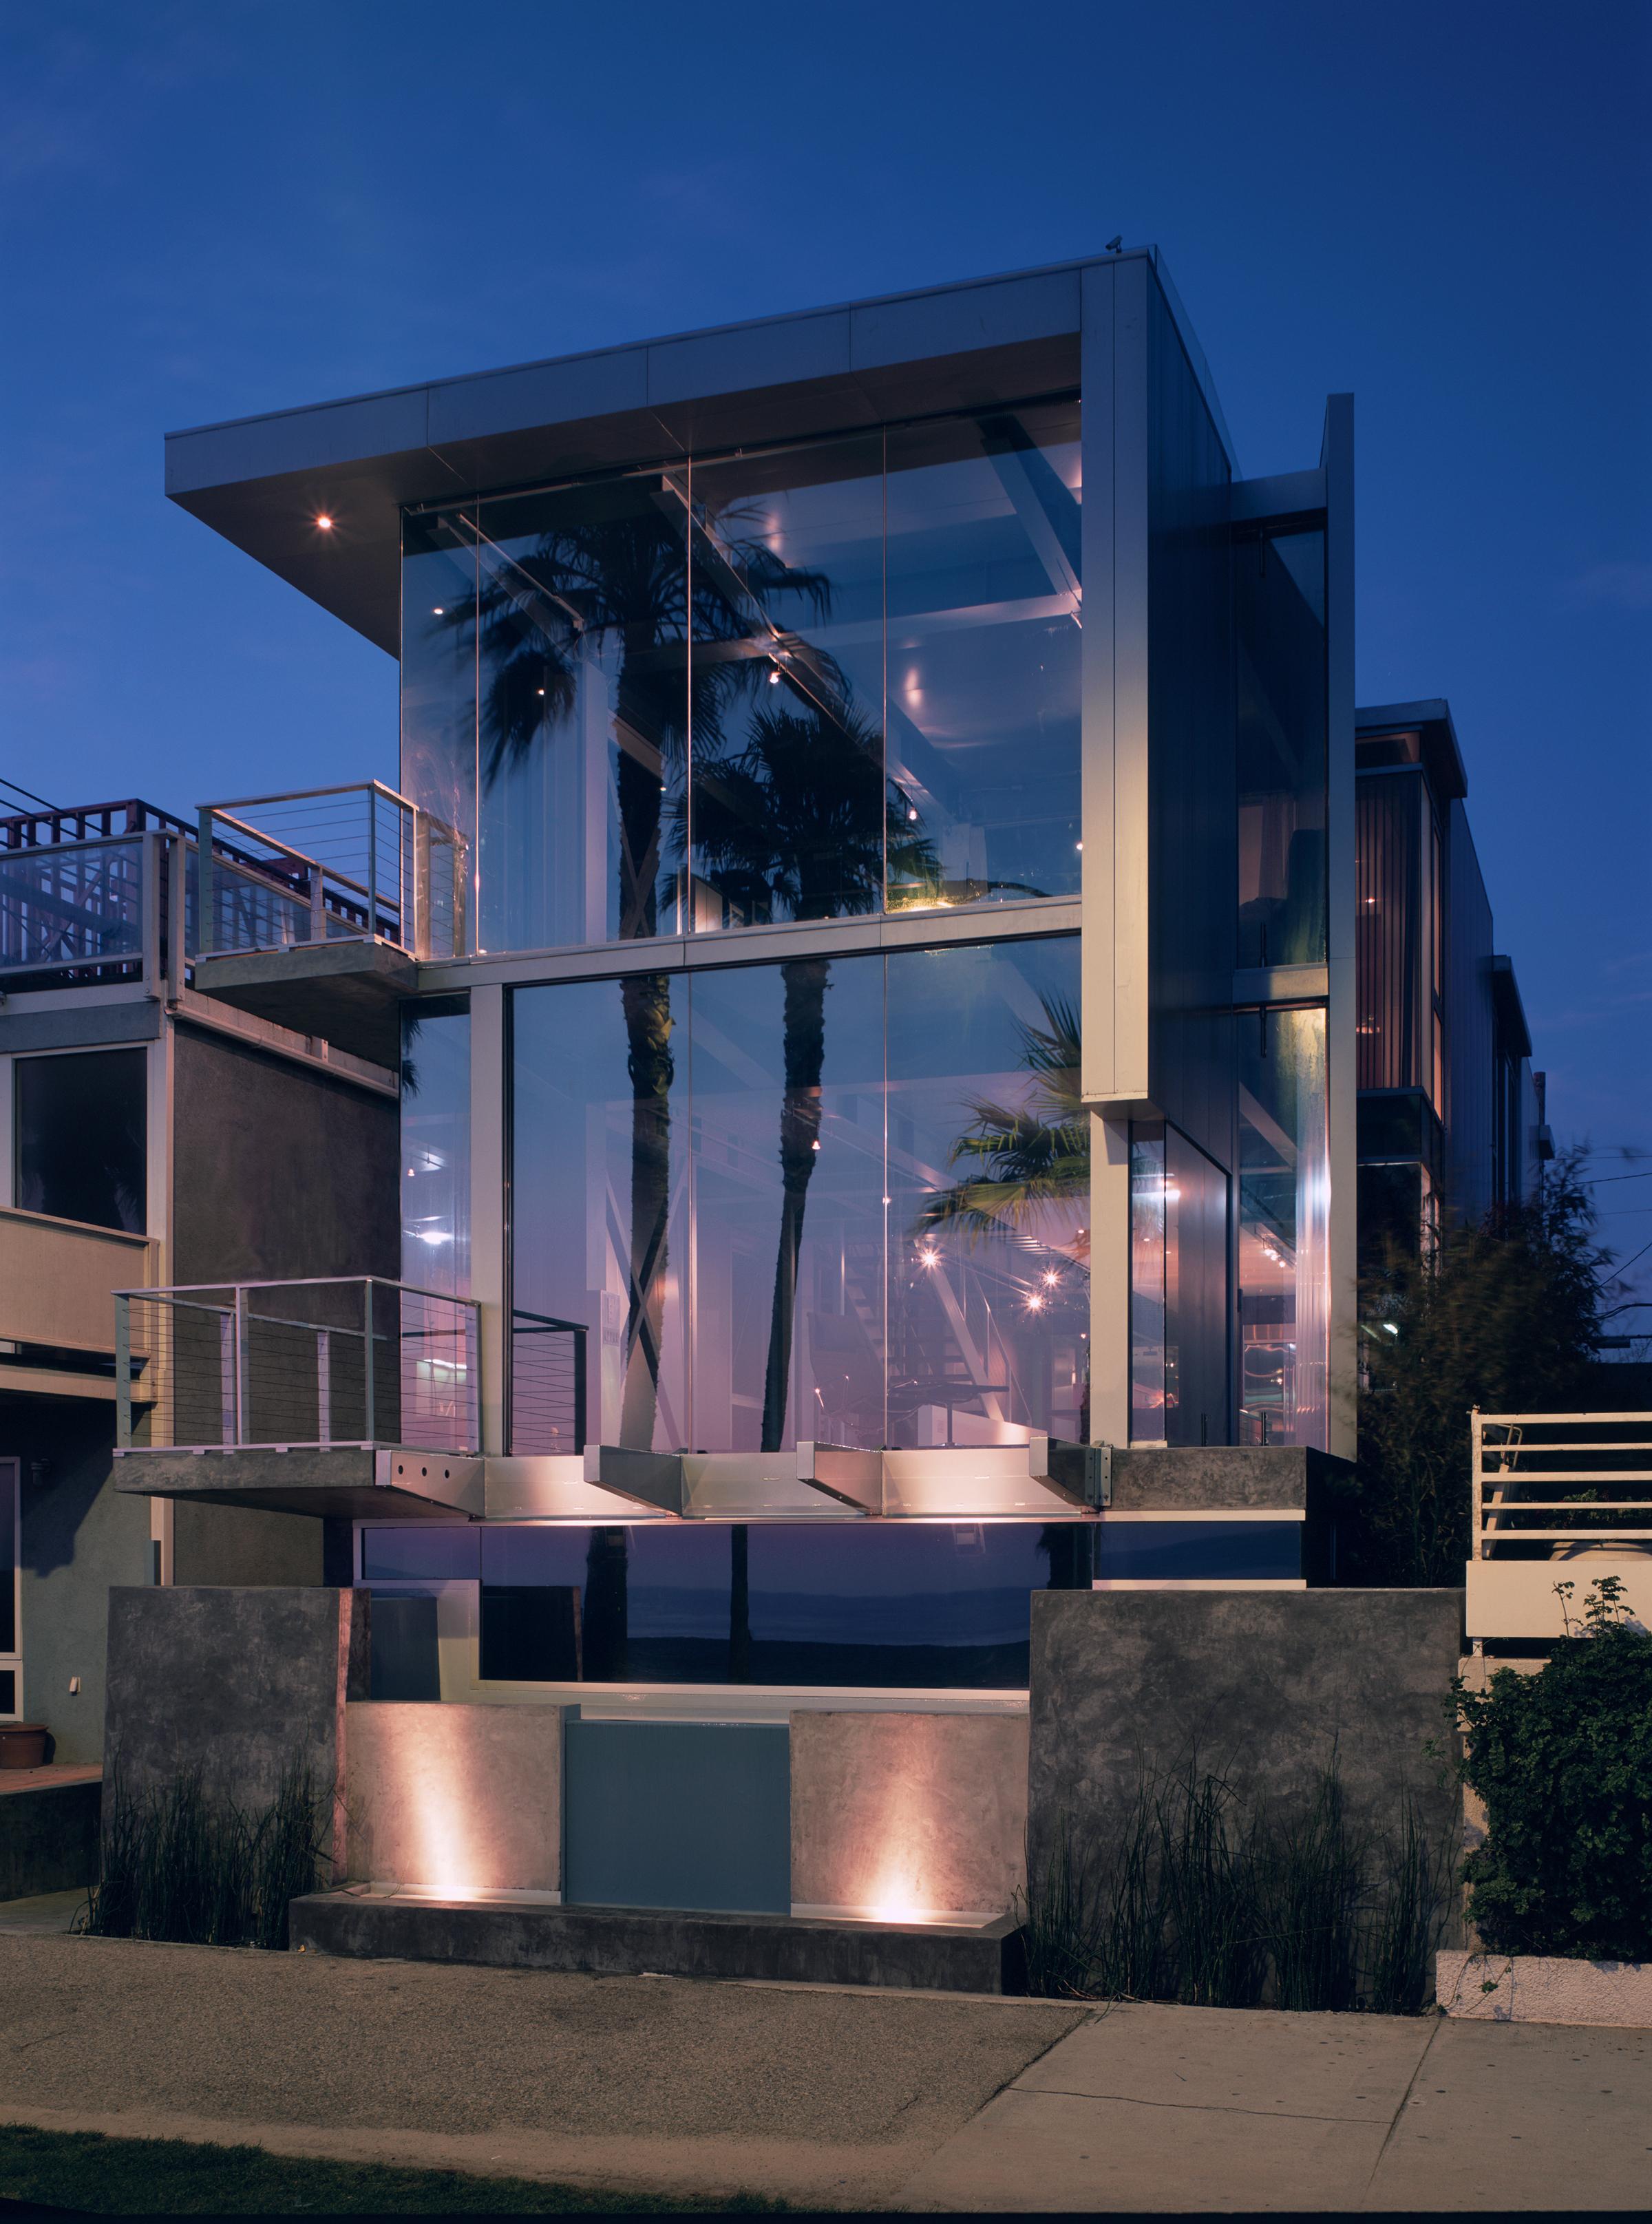 S.E.A.-Studio-Environmental-Architecture-David-Hertz-FAIA-Panel-House-Venice-Beach-California-sustainable-regenerative-restorative-green-design-prefabricated-aluminum-refrigeration-open-concept-ocean-view-residential-glass-steel-sunset-exterior-1.jpg